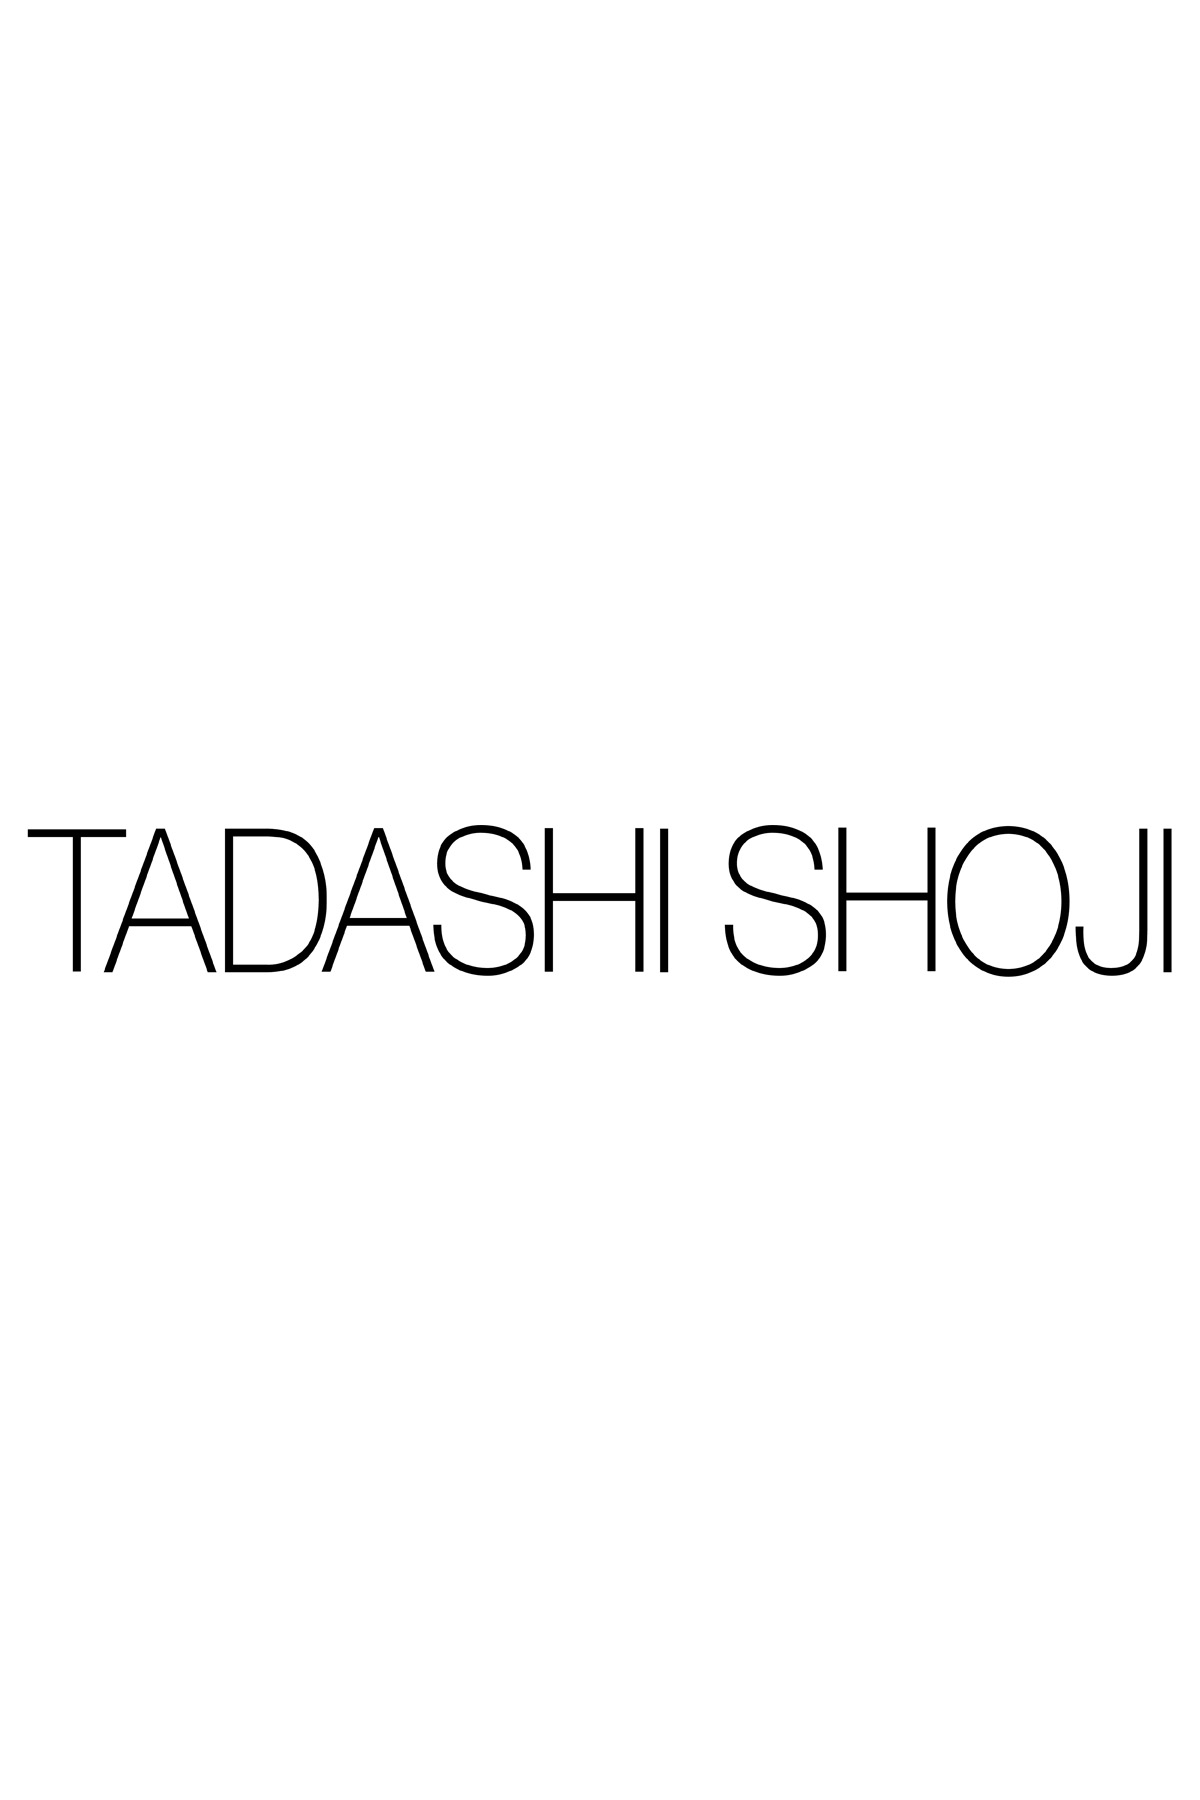 Tadashi Shoji - Embroidered Lace Blouson Waist Gown - Detail